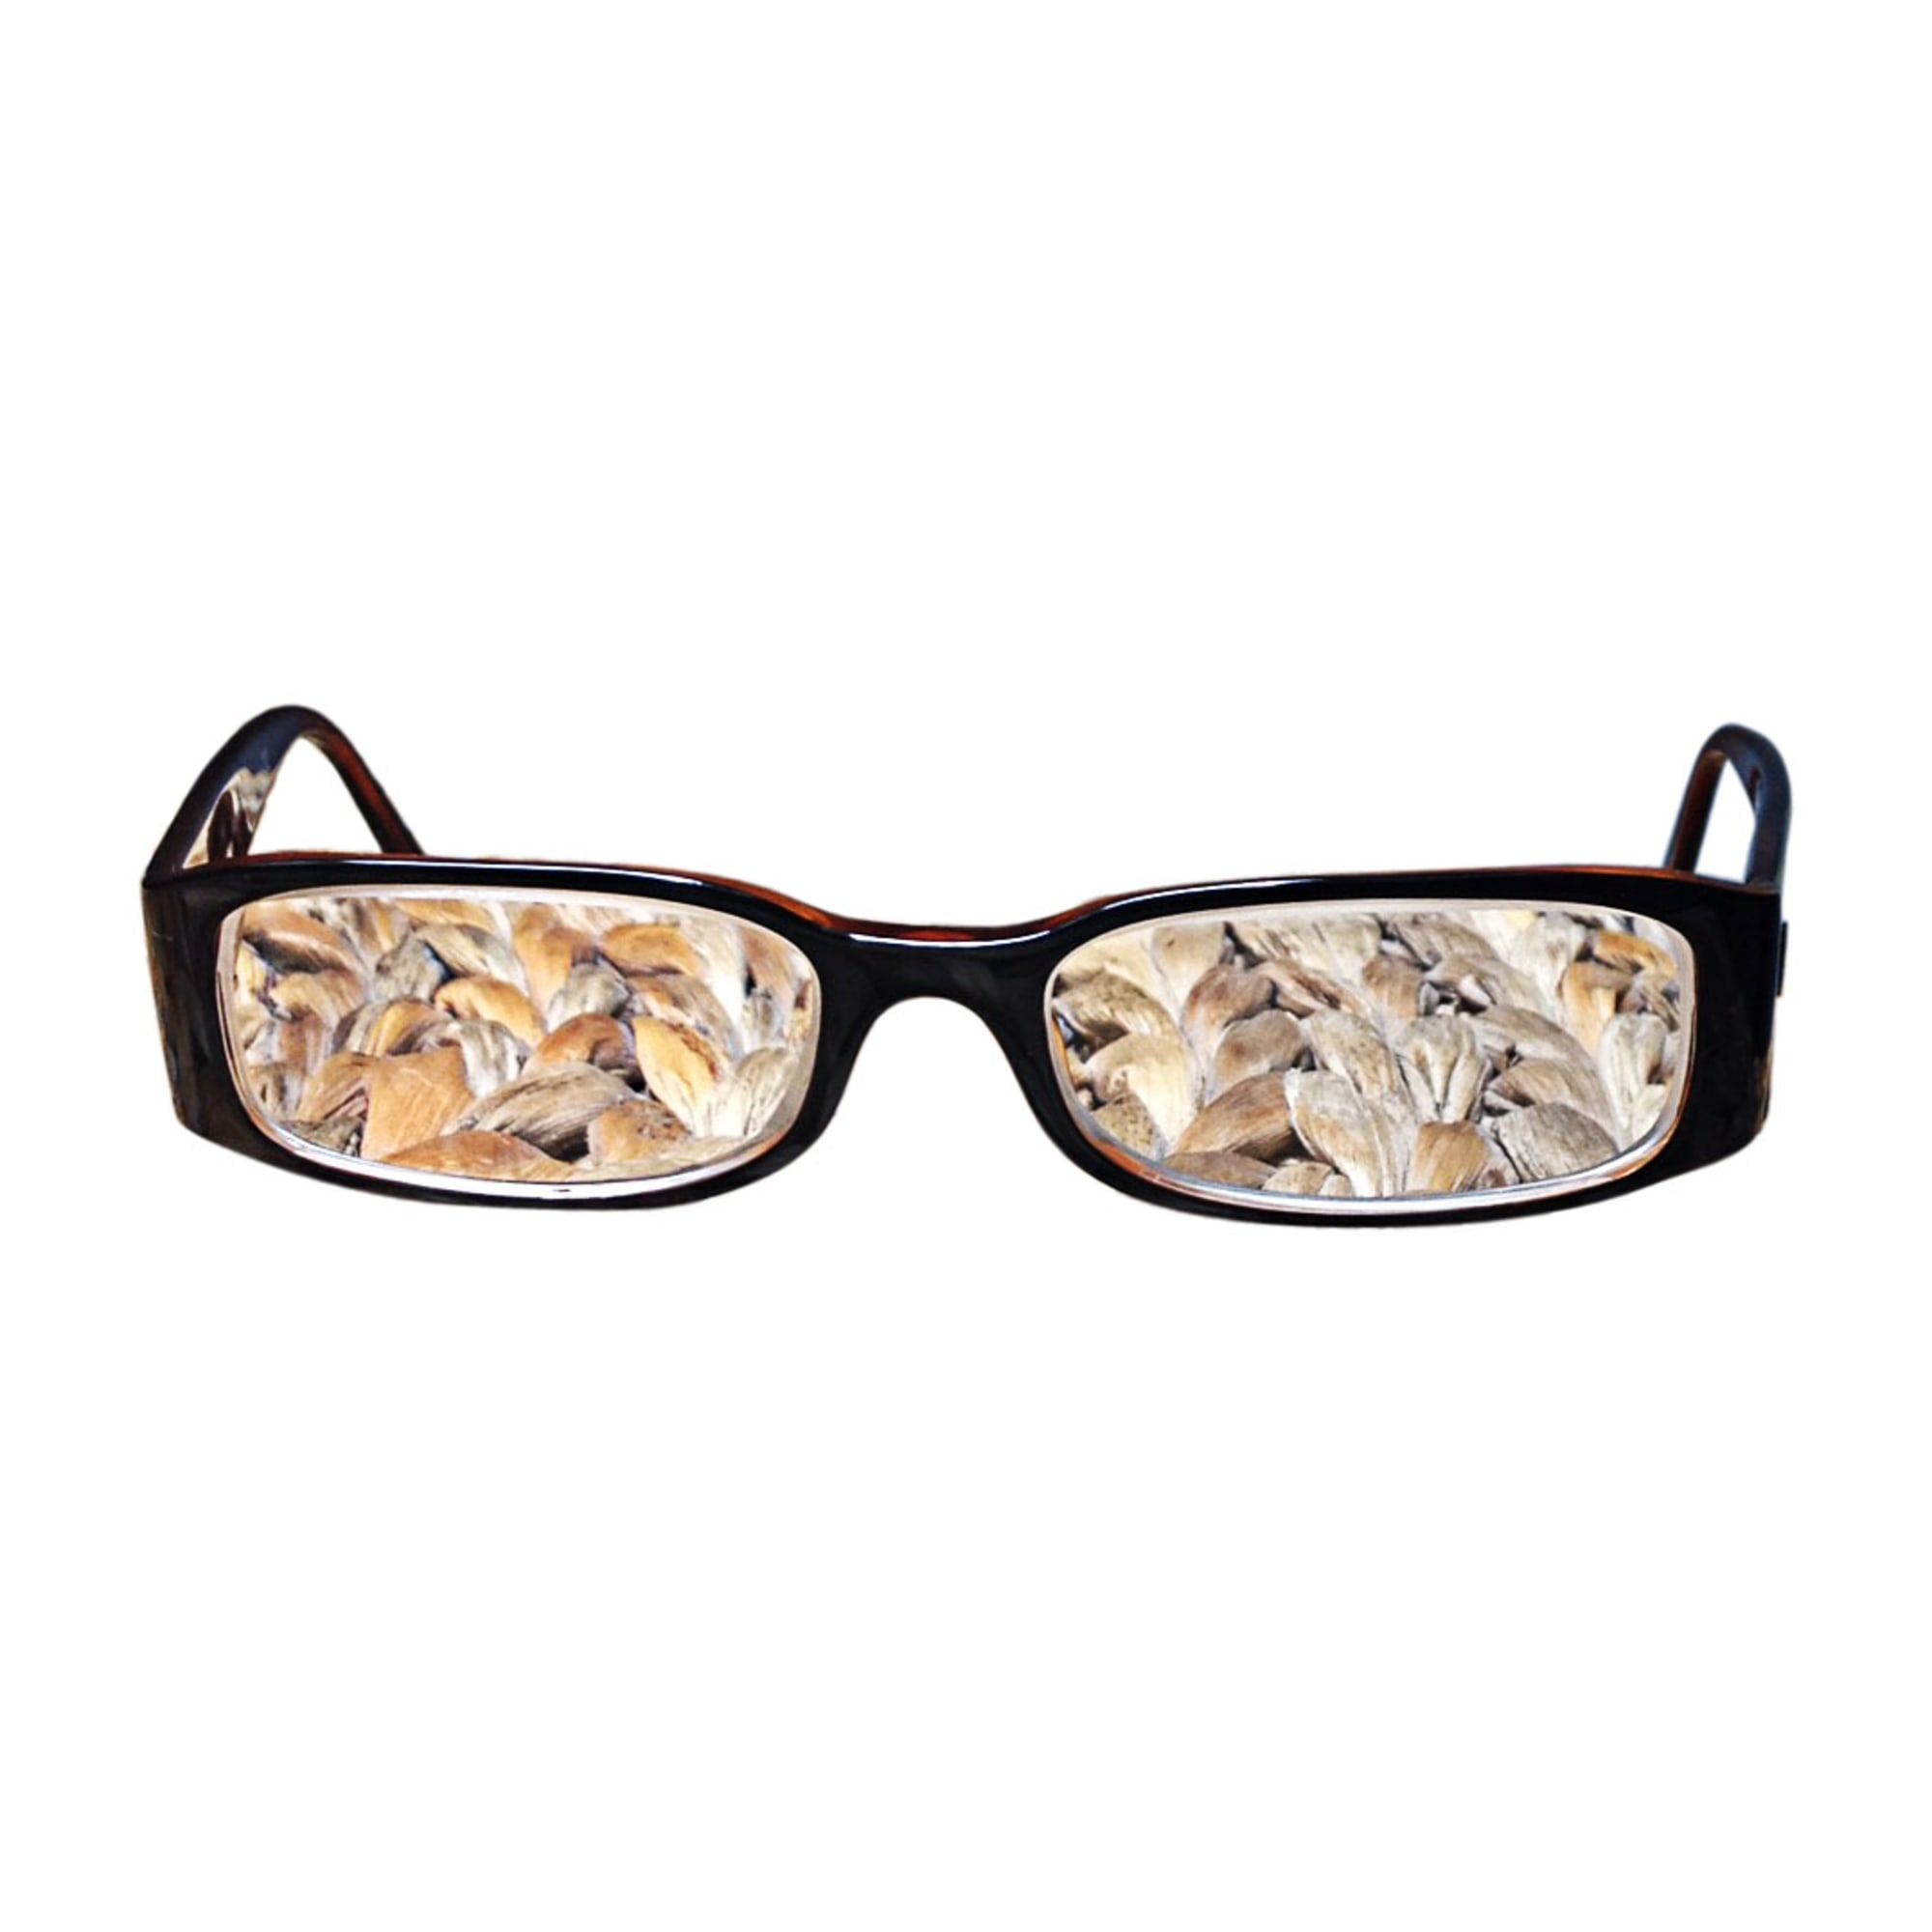 Eyeglass Frames CHANEL Brown